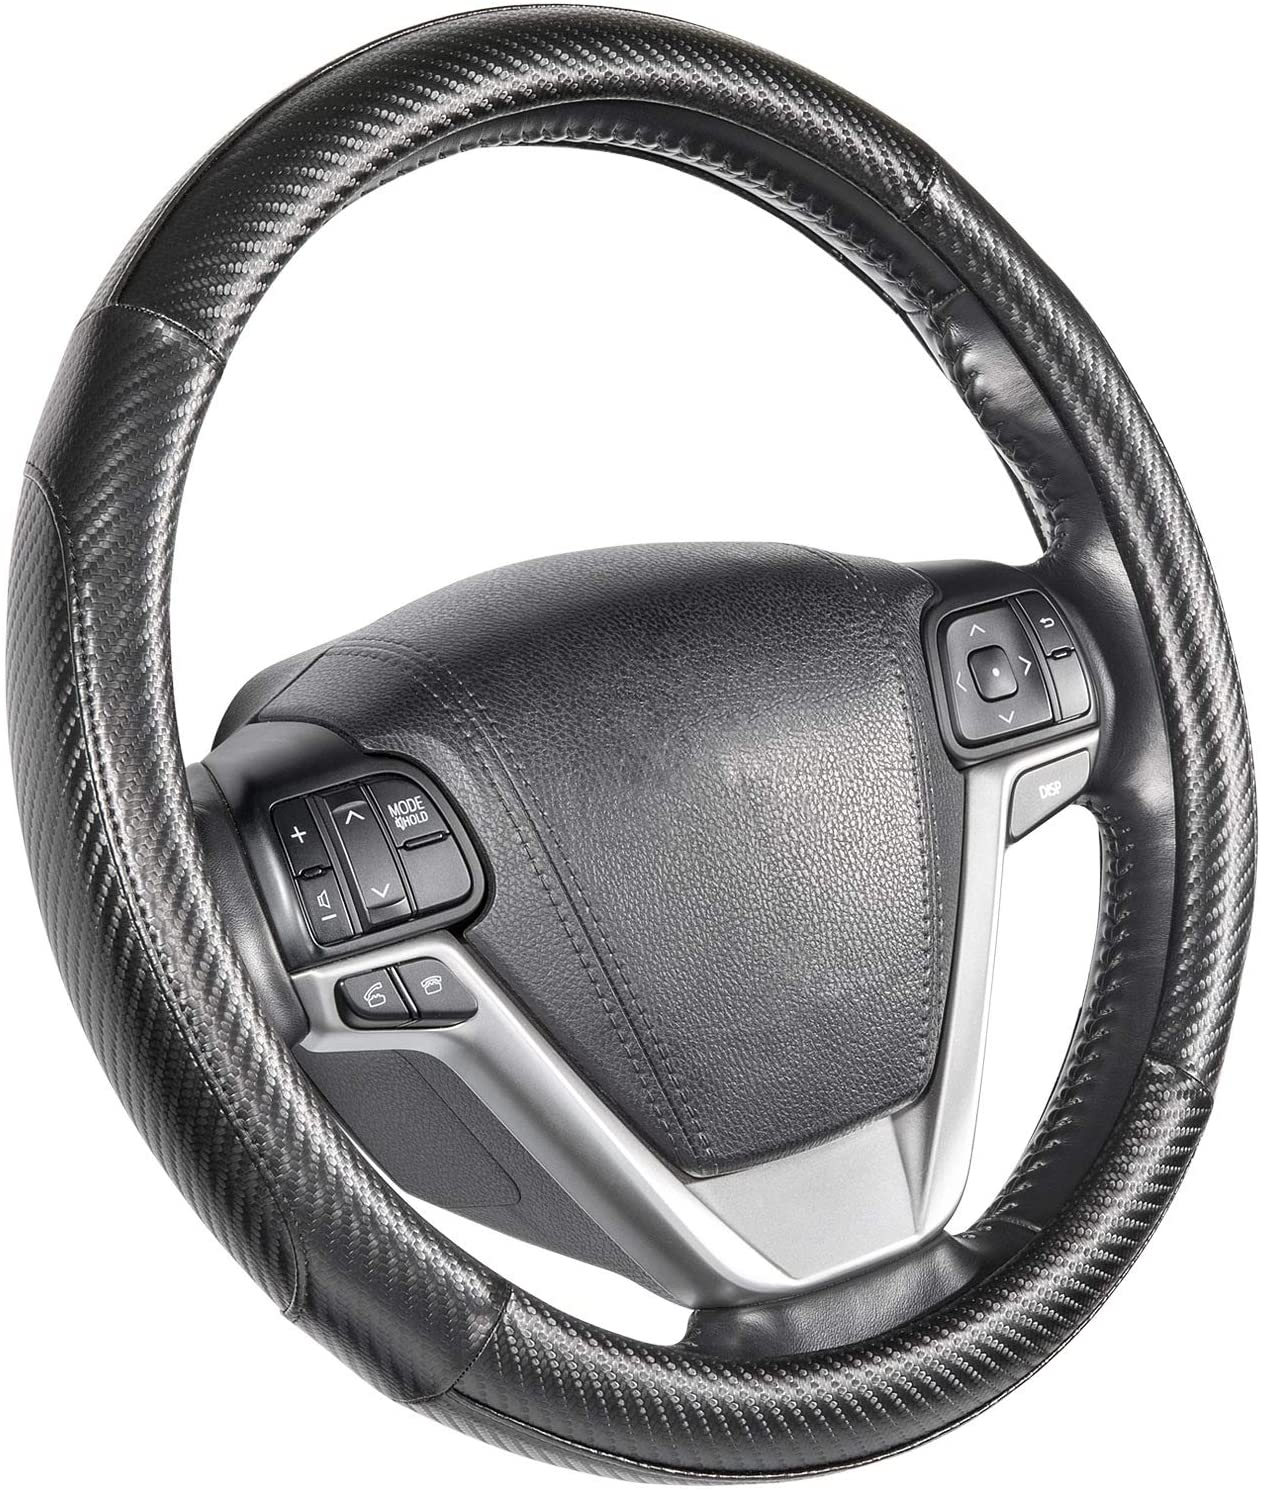 SEG Direct Steering Wheel Covers Black Carbon Fiber Pattern Large Size 15 1/2